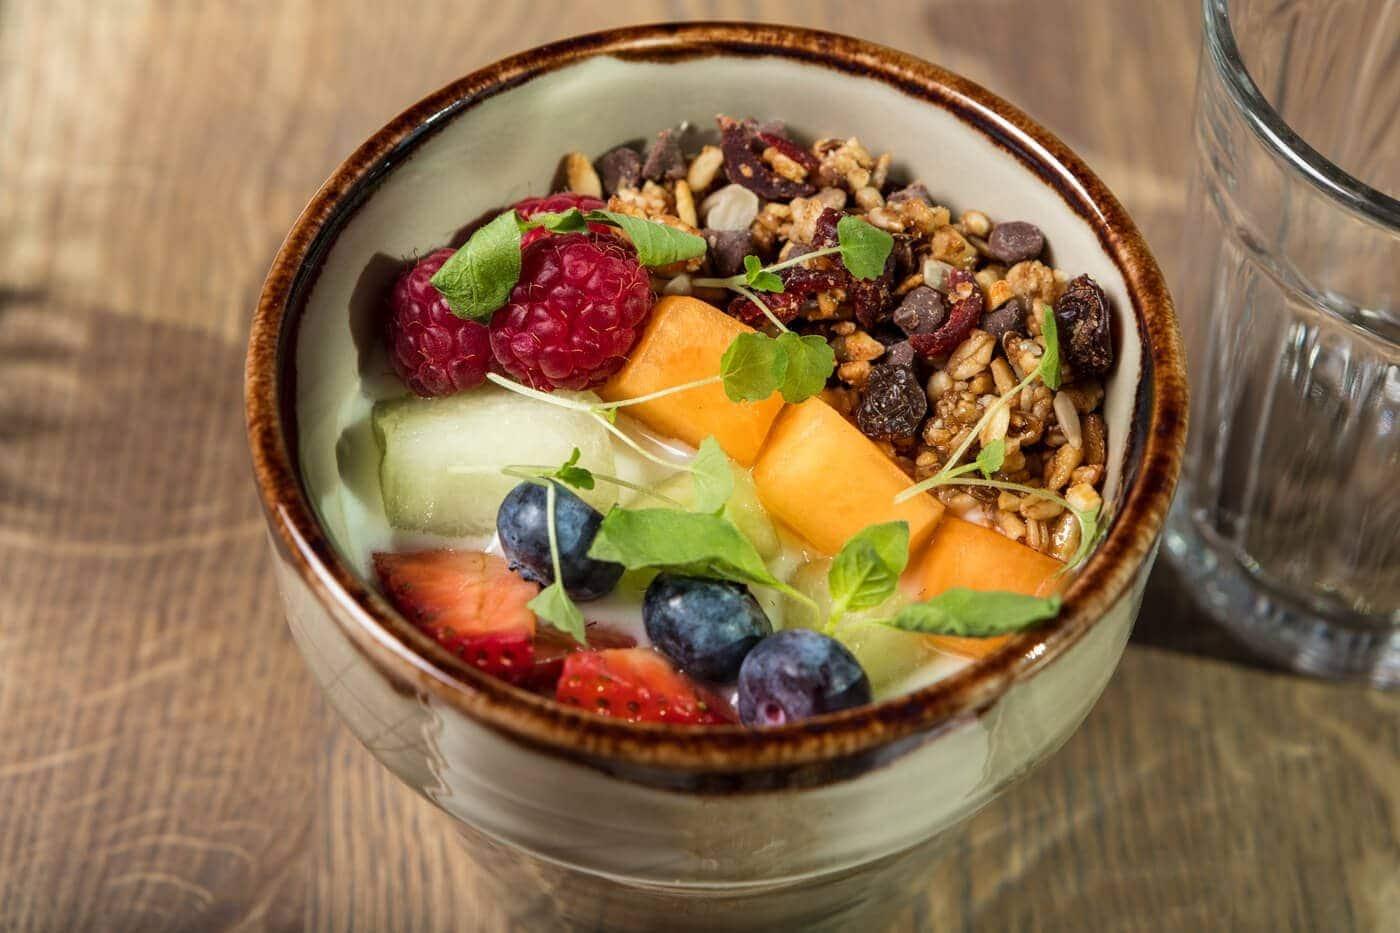 food-photography-yoghurt-vers-fruit-granola-bleecker-coffee-and-more